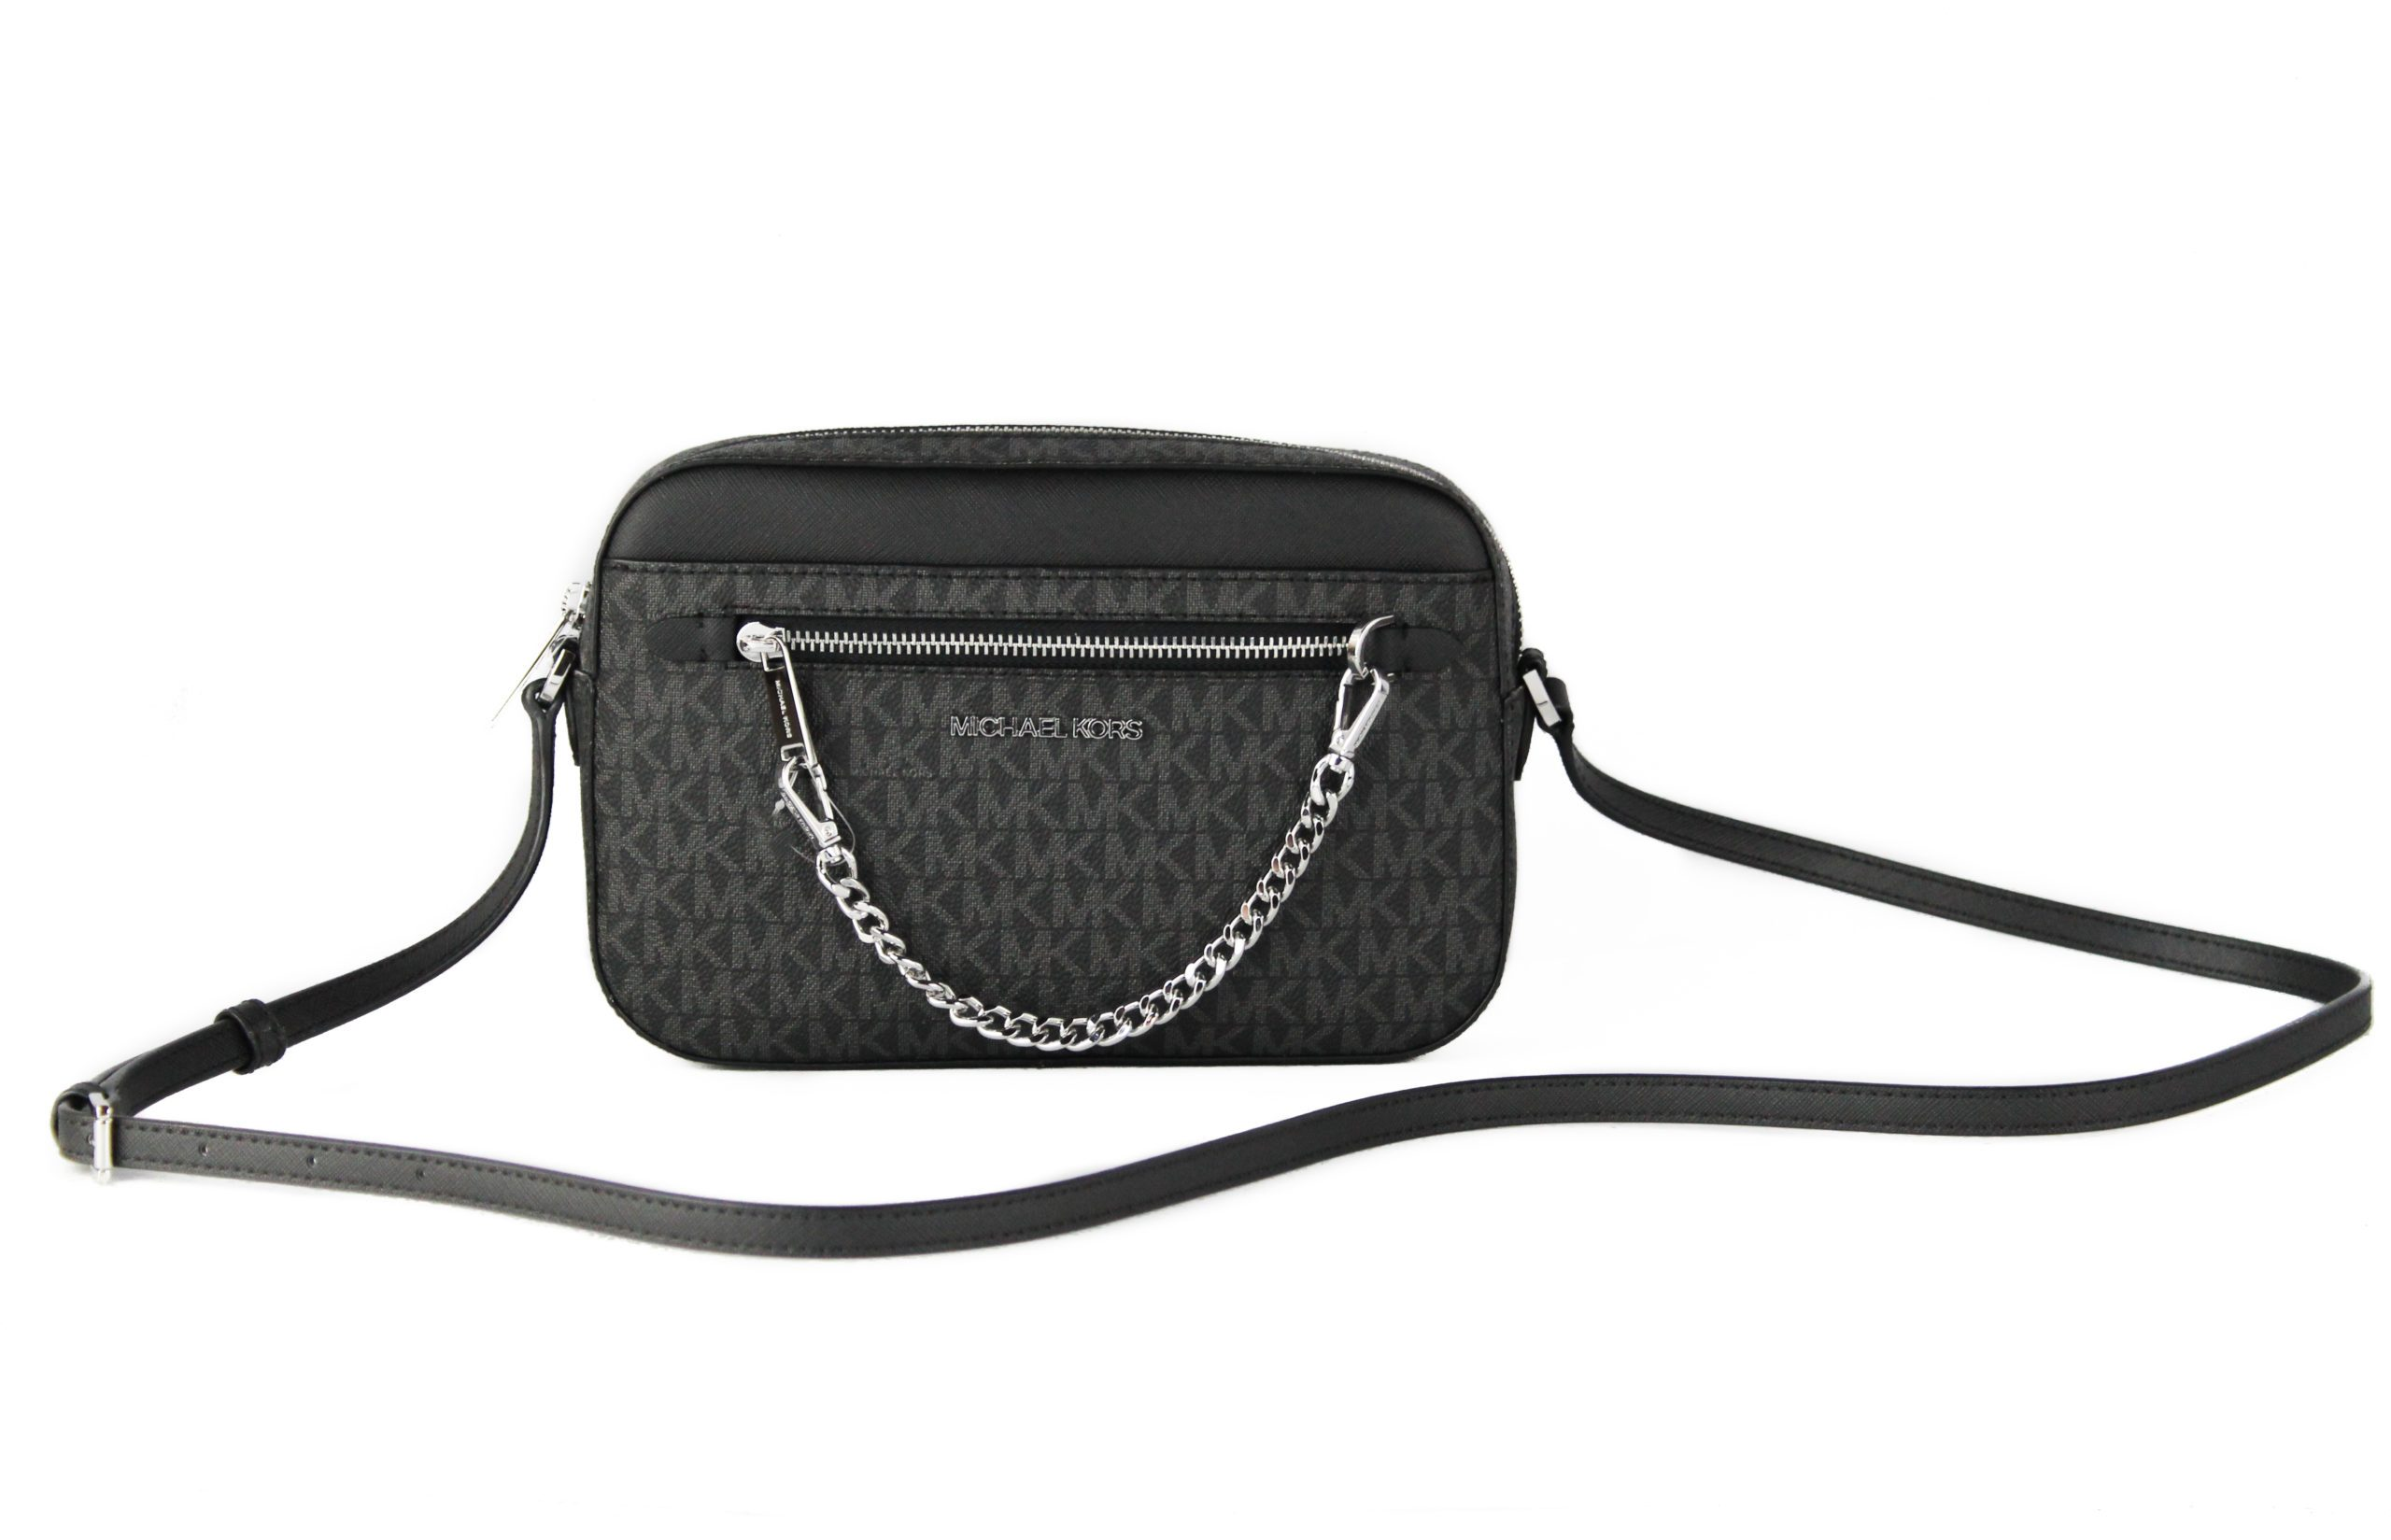 Michael Kors Women's Jet Set Item Crossbody Bag Black 89778